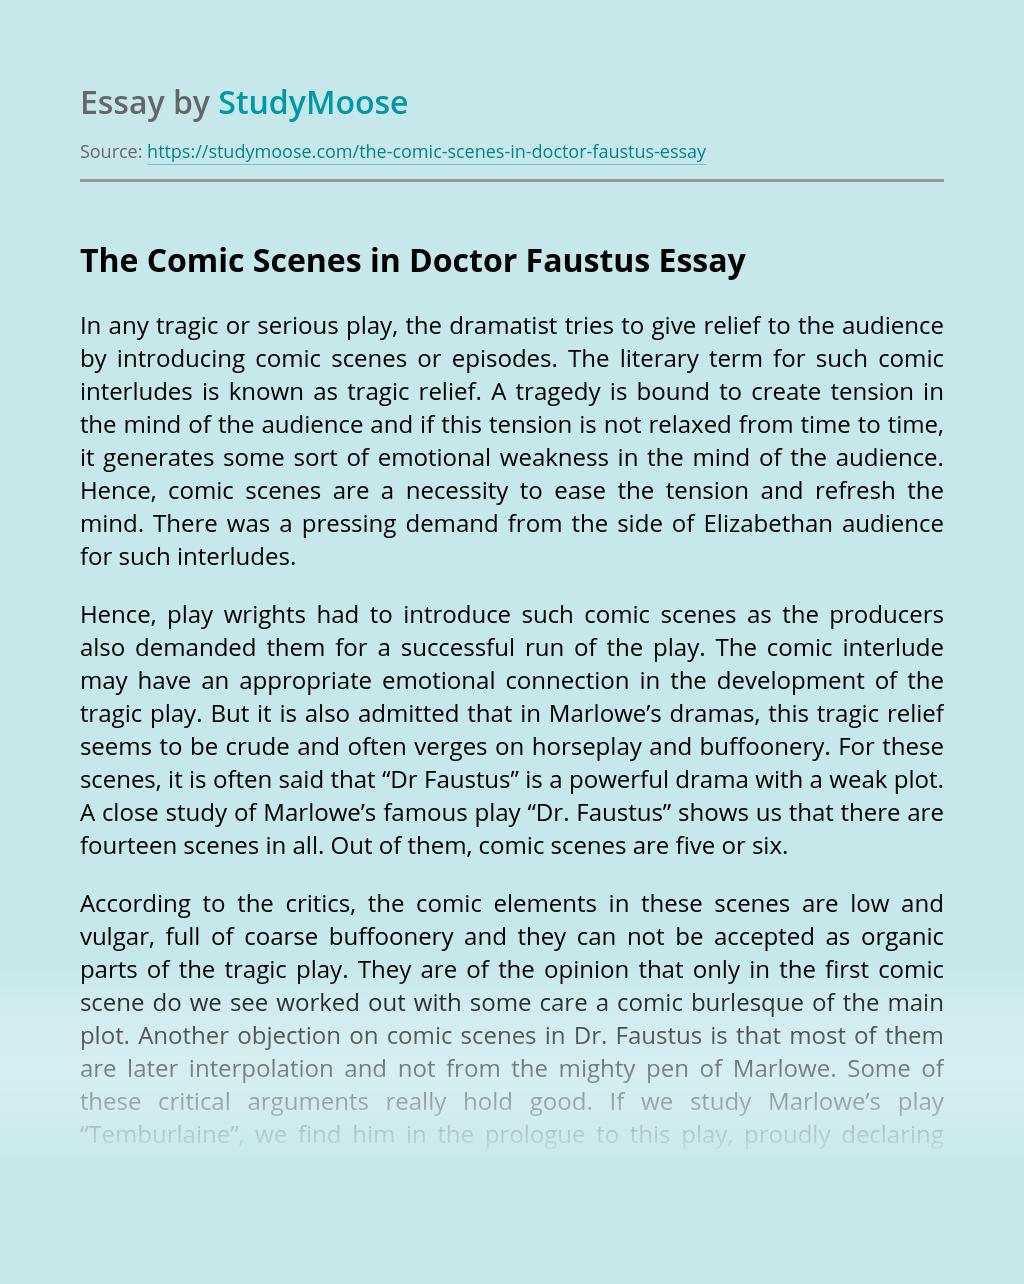 The Comic Scenes in Doctor Faustus